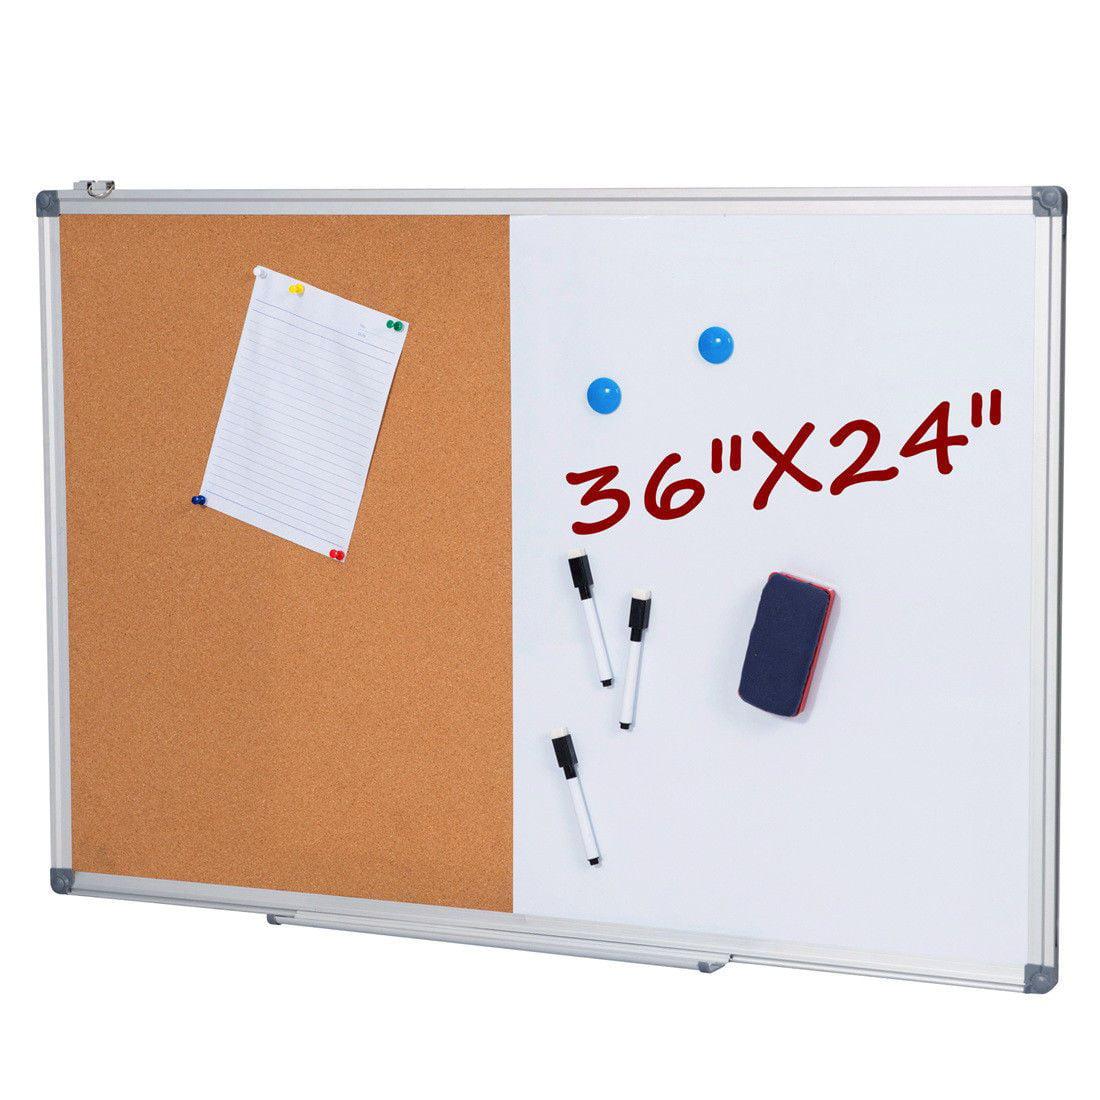 36 x 24 Inch Dry Erase and Cork Bulletin Board Set 1 2 Corkboard Whiteboard by